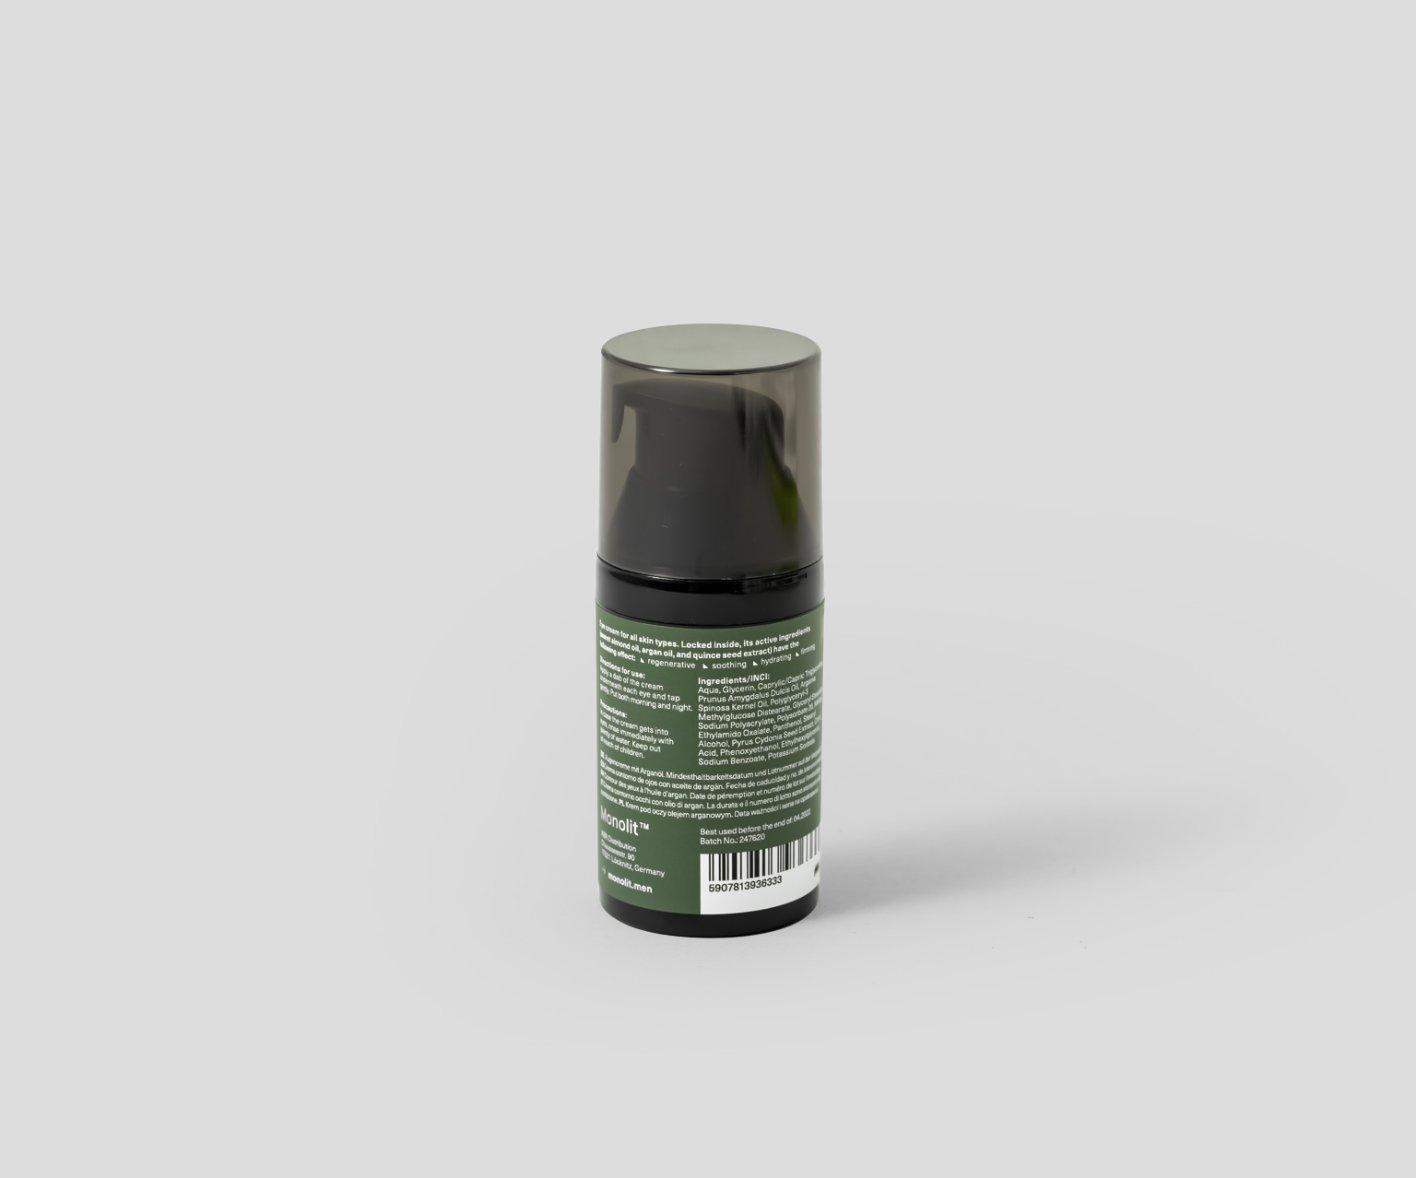 Monolit Krem pod oczy z olejem arganowym 30ml